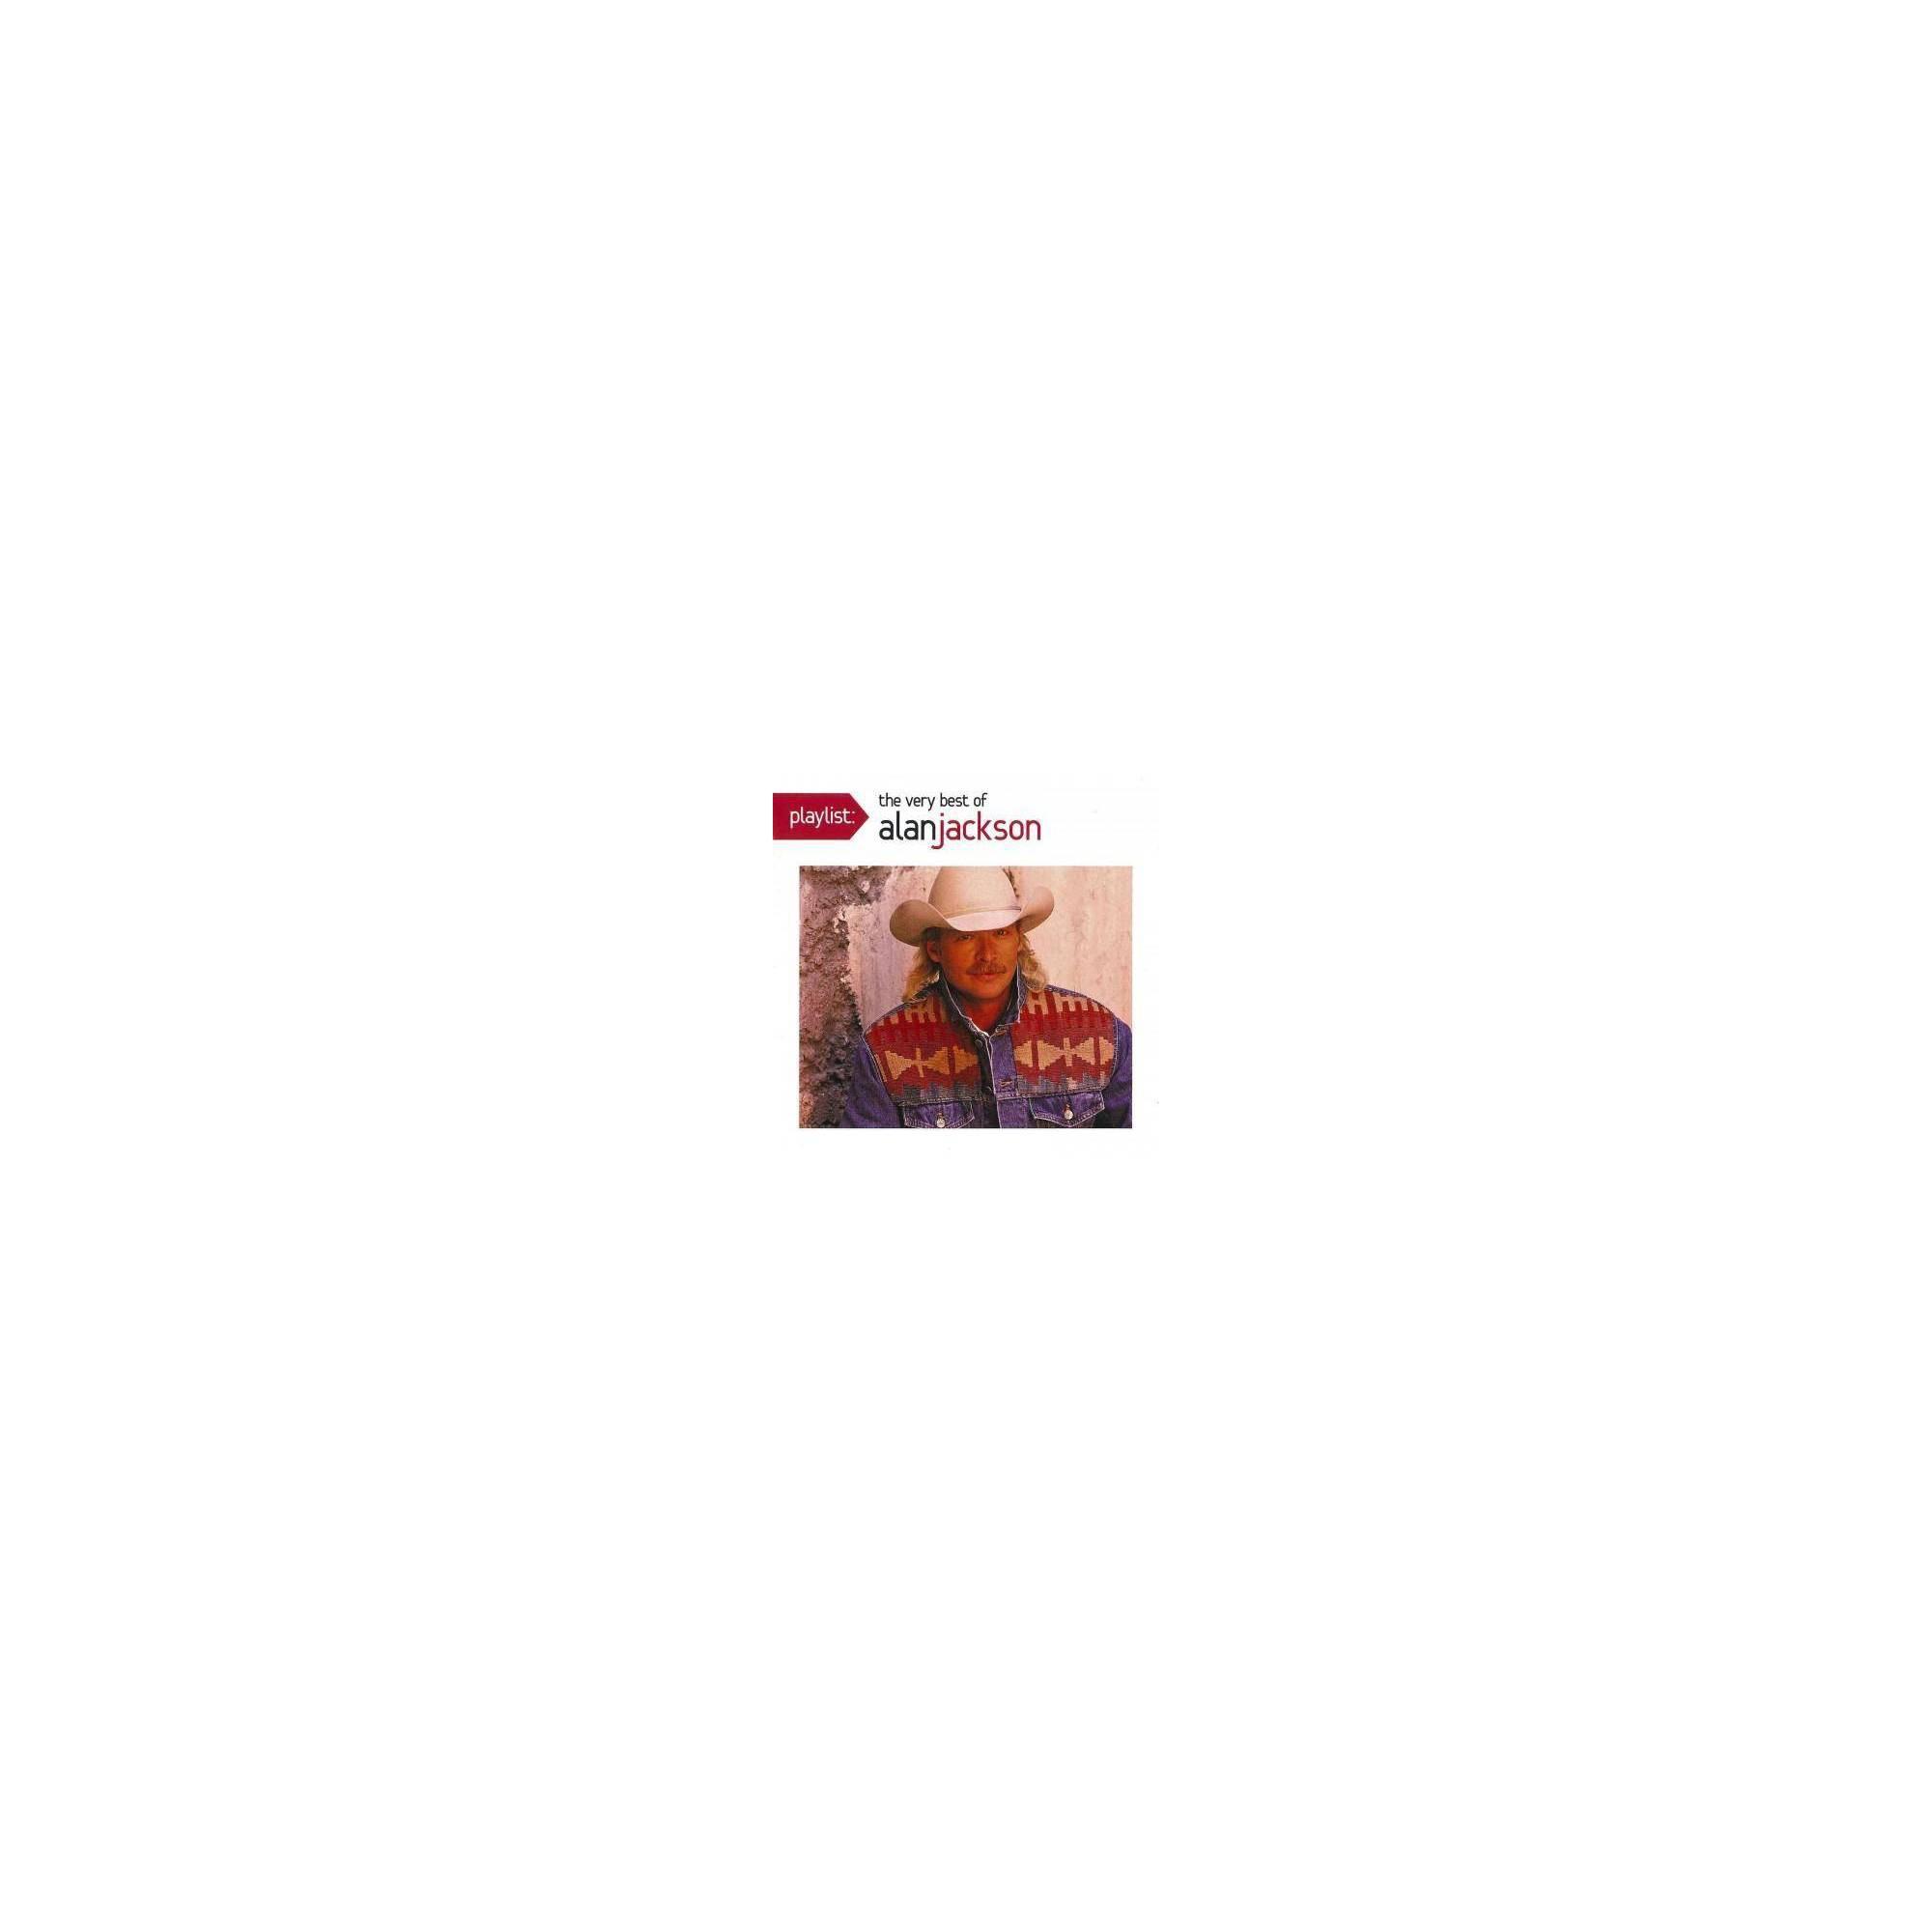 Alan Jackson - Playlist: The Very Best Of Alan Jackson (CD)